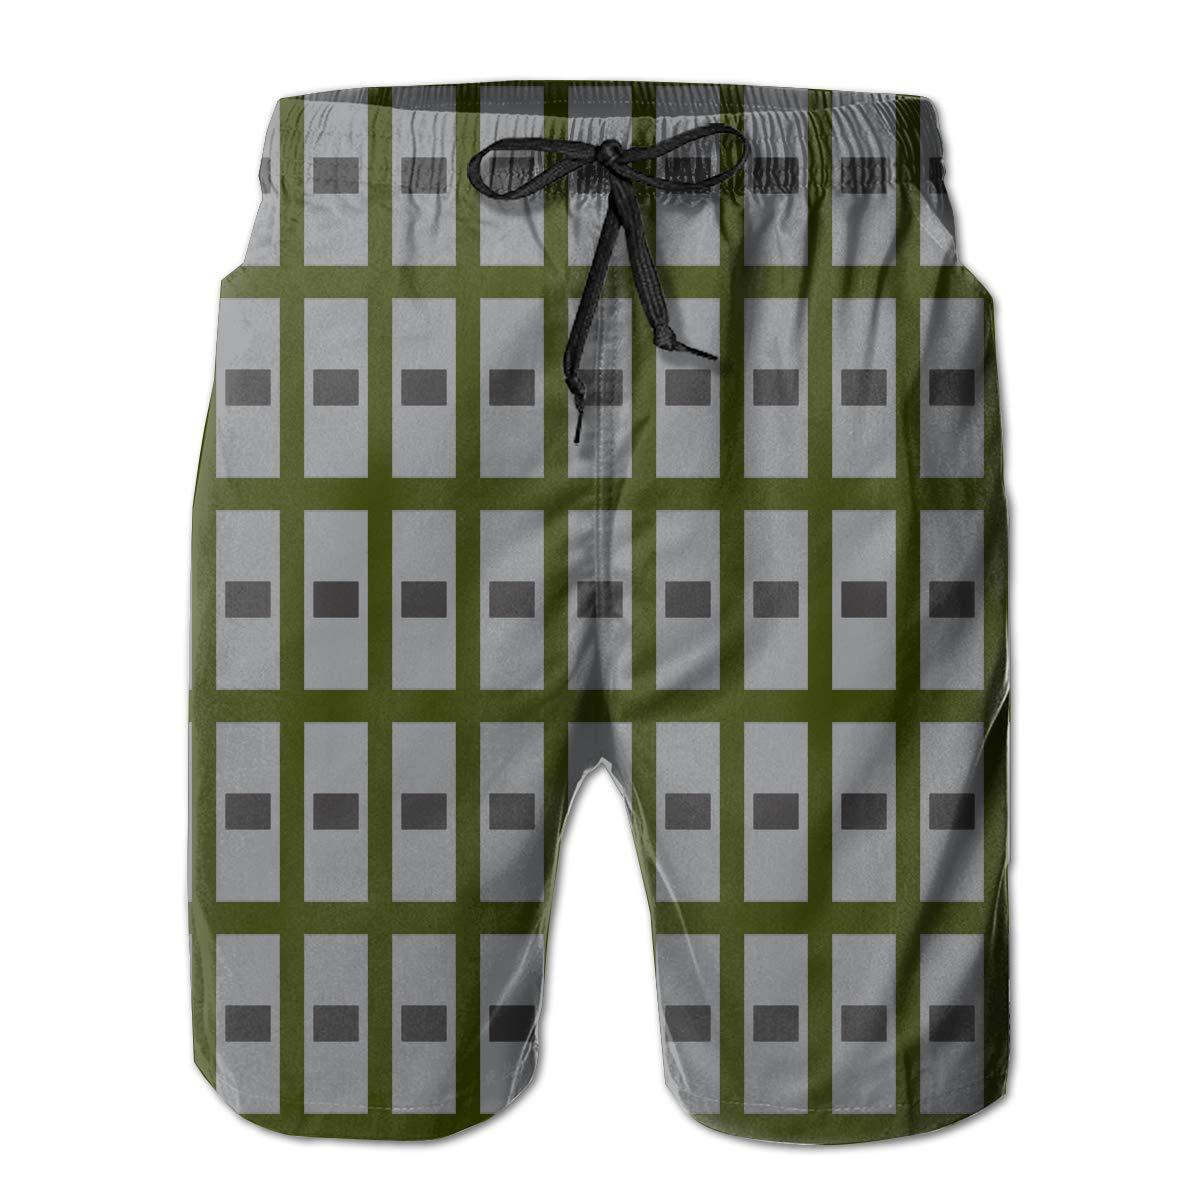 AIYIZHEN Army Warrant Officer 1 Rank Mens Beach Shorts Swim Trunks Swimsuit